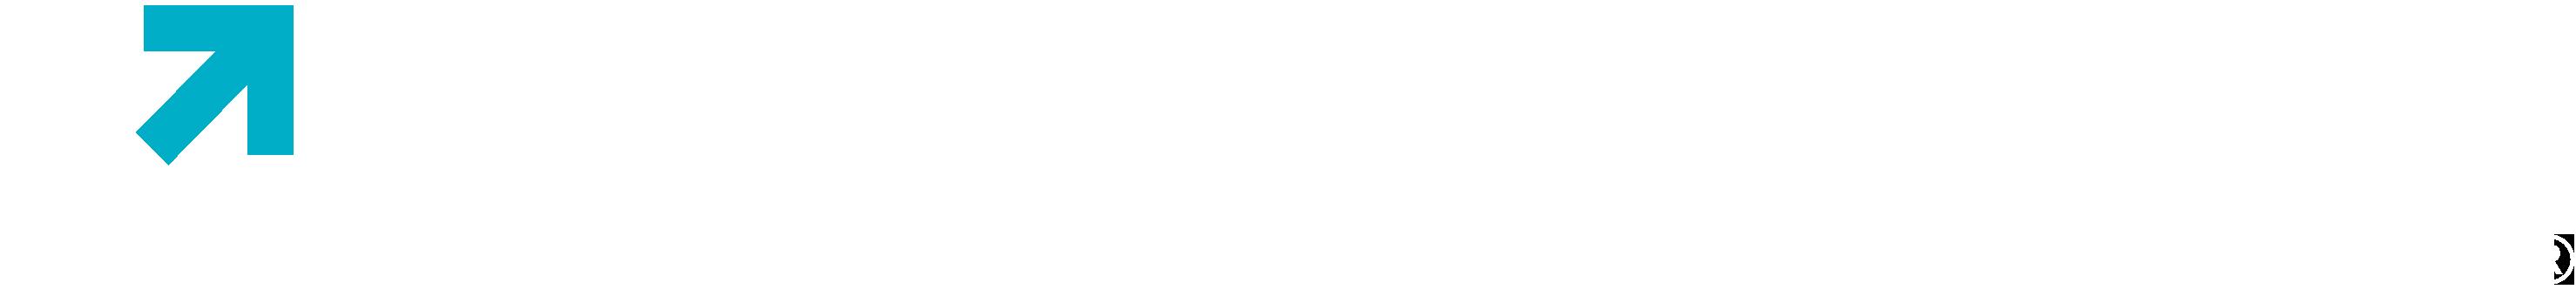 testosteronology logo